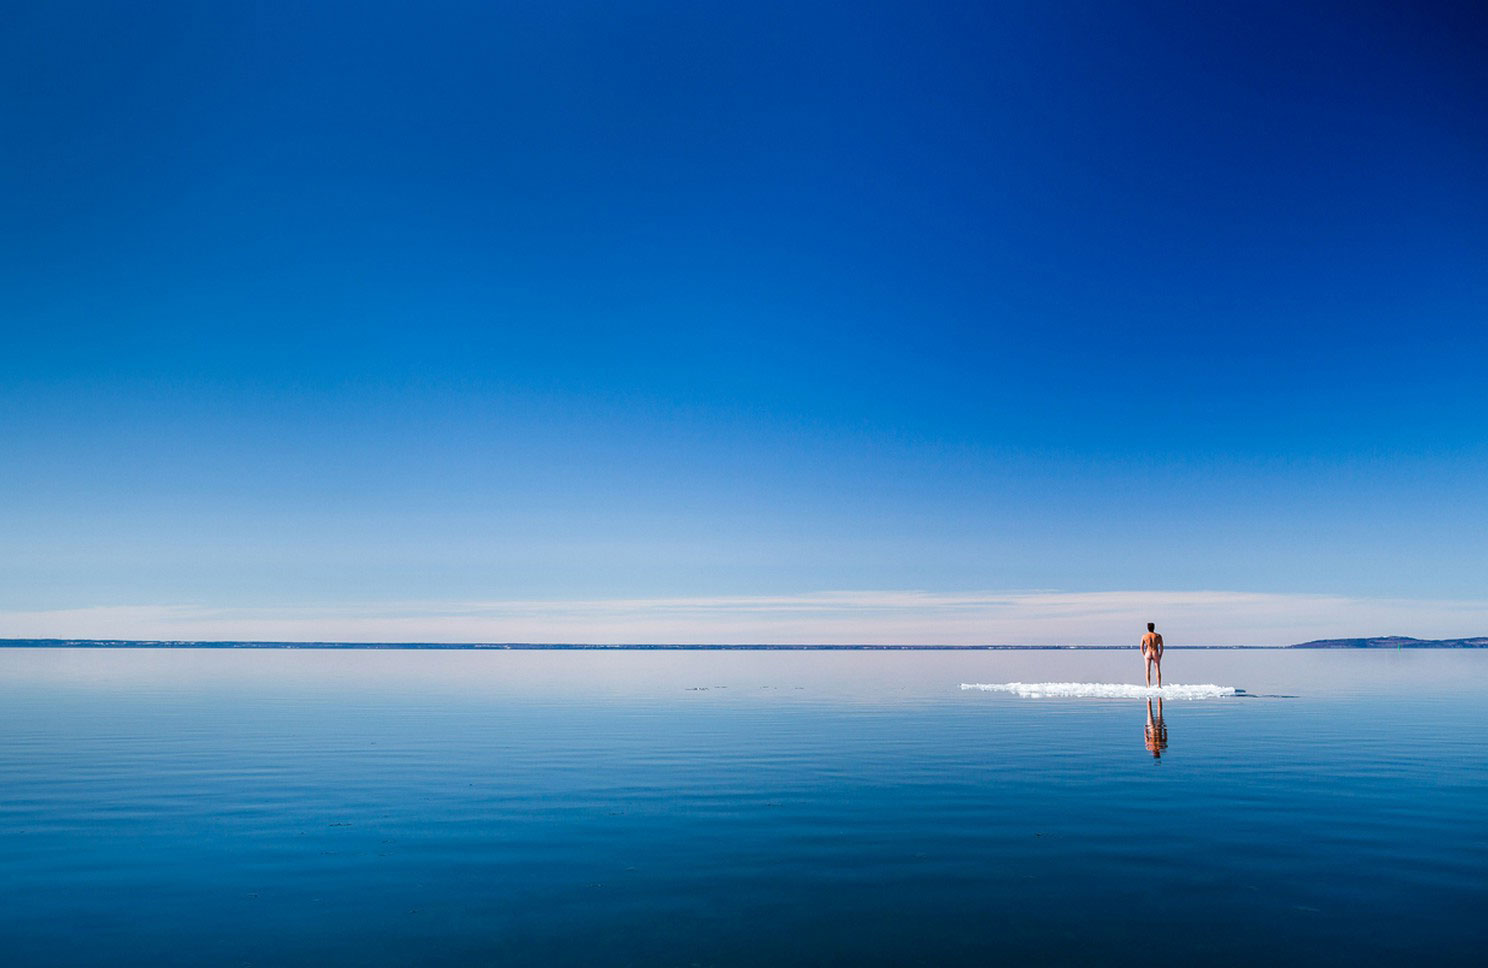 мужчина на льдине